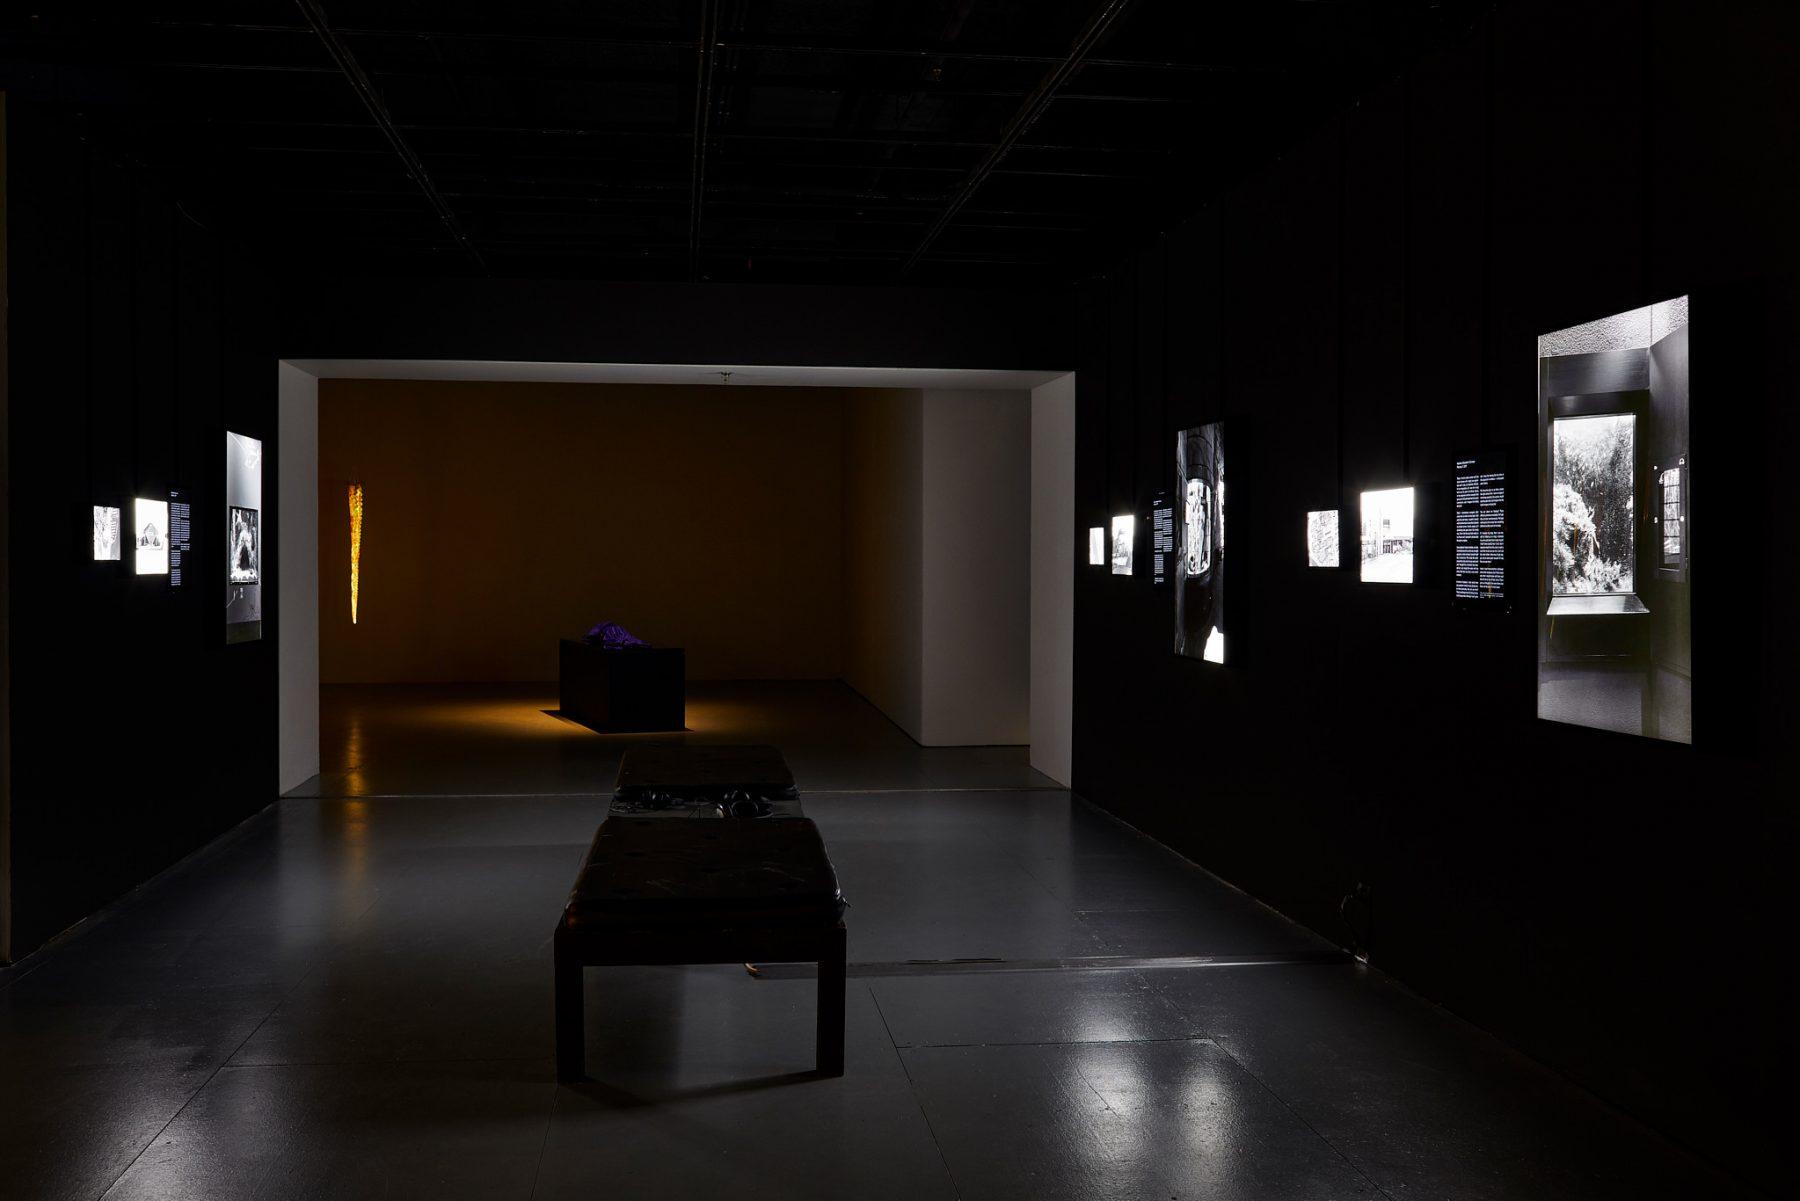 Installation View, Okto-Lab, Plimsoll Gallery, Hobart, Tasmania,  Photo Rémi Chauvin